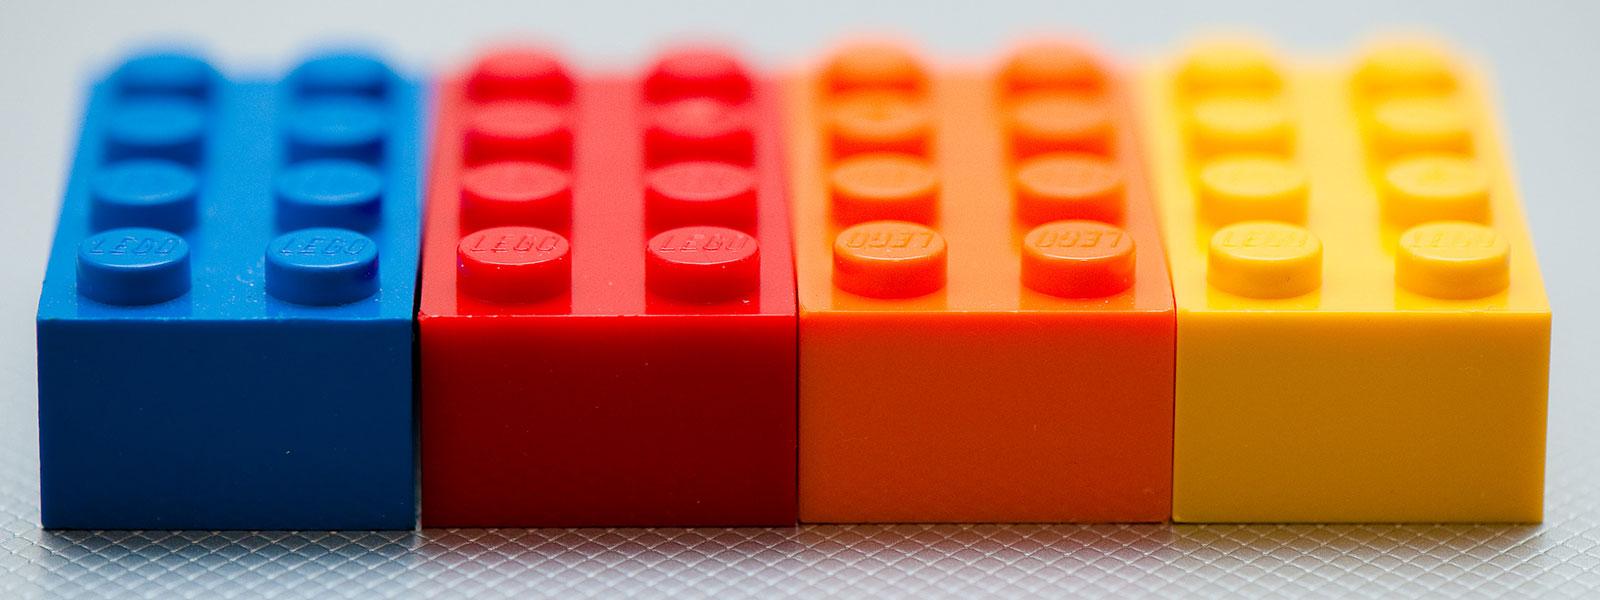 Lego Bricks Colorful